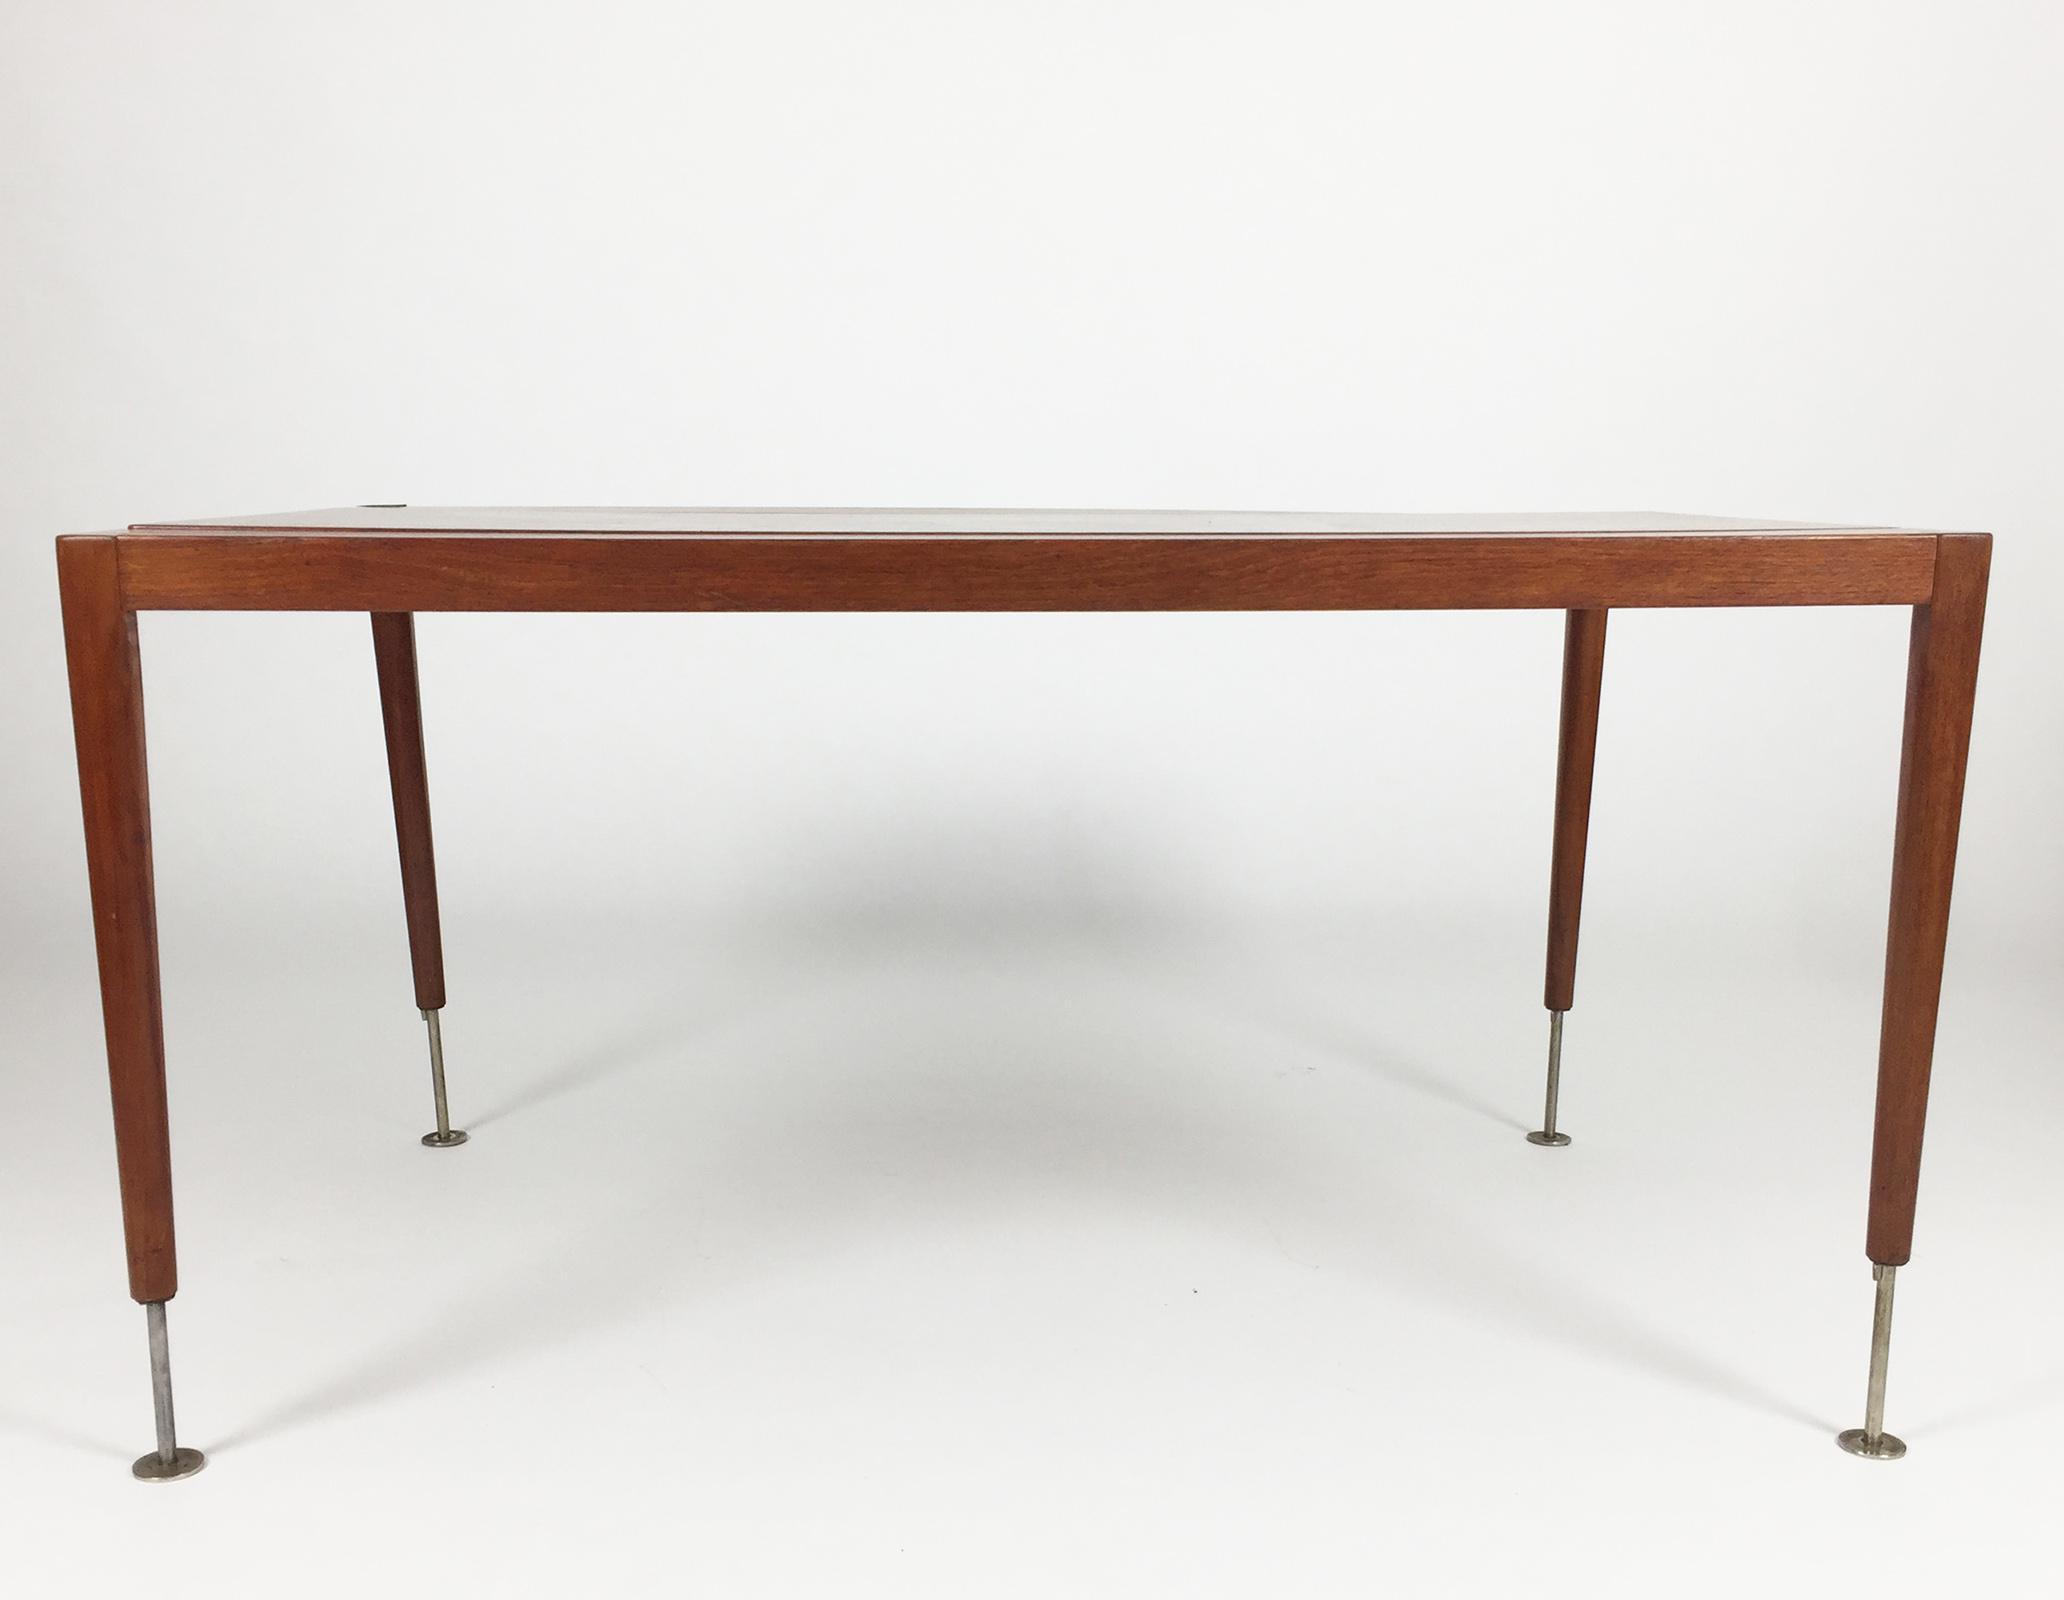 Adjustable Danish Elevator Table With Chrome Legs 1960